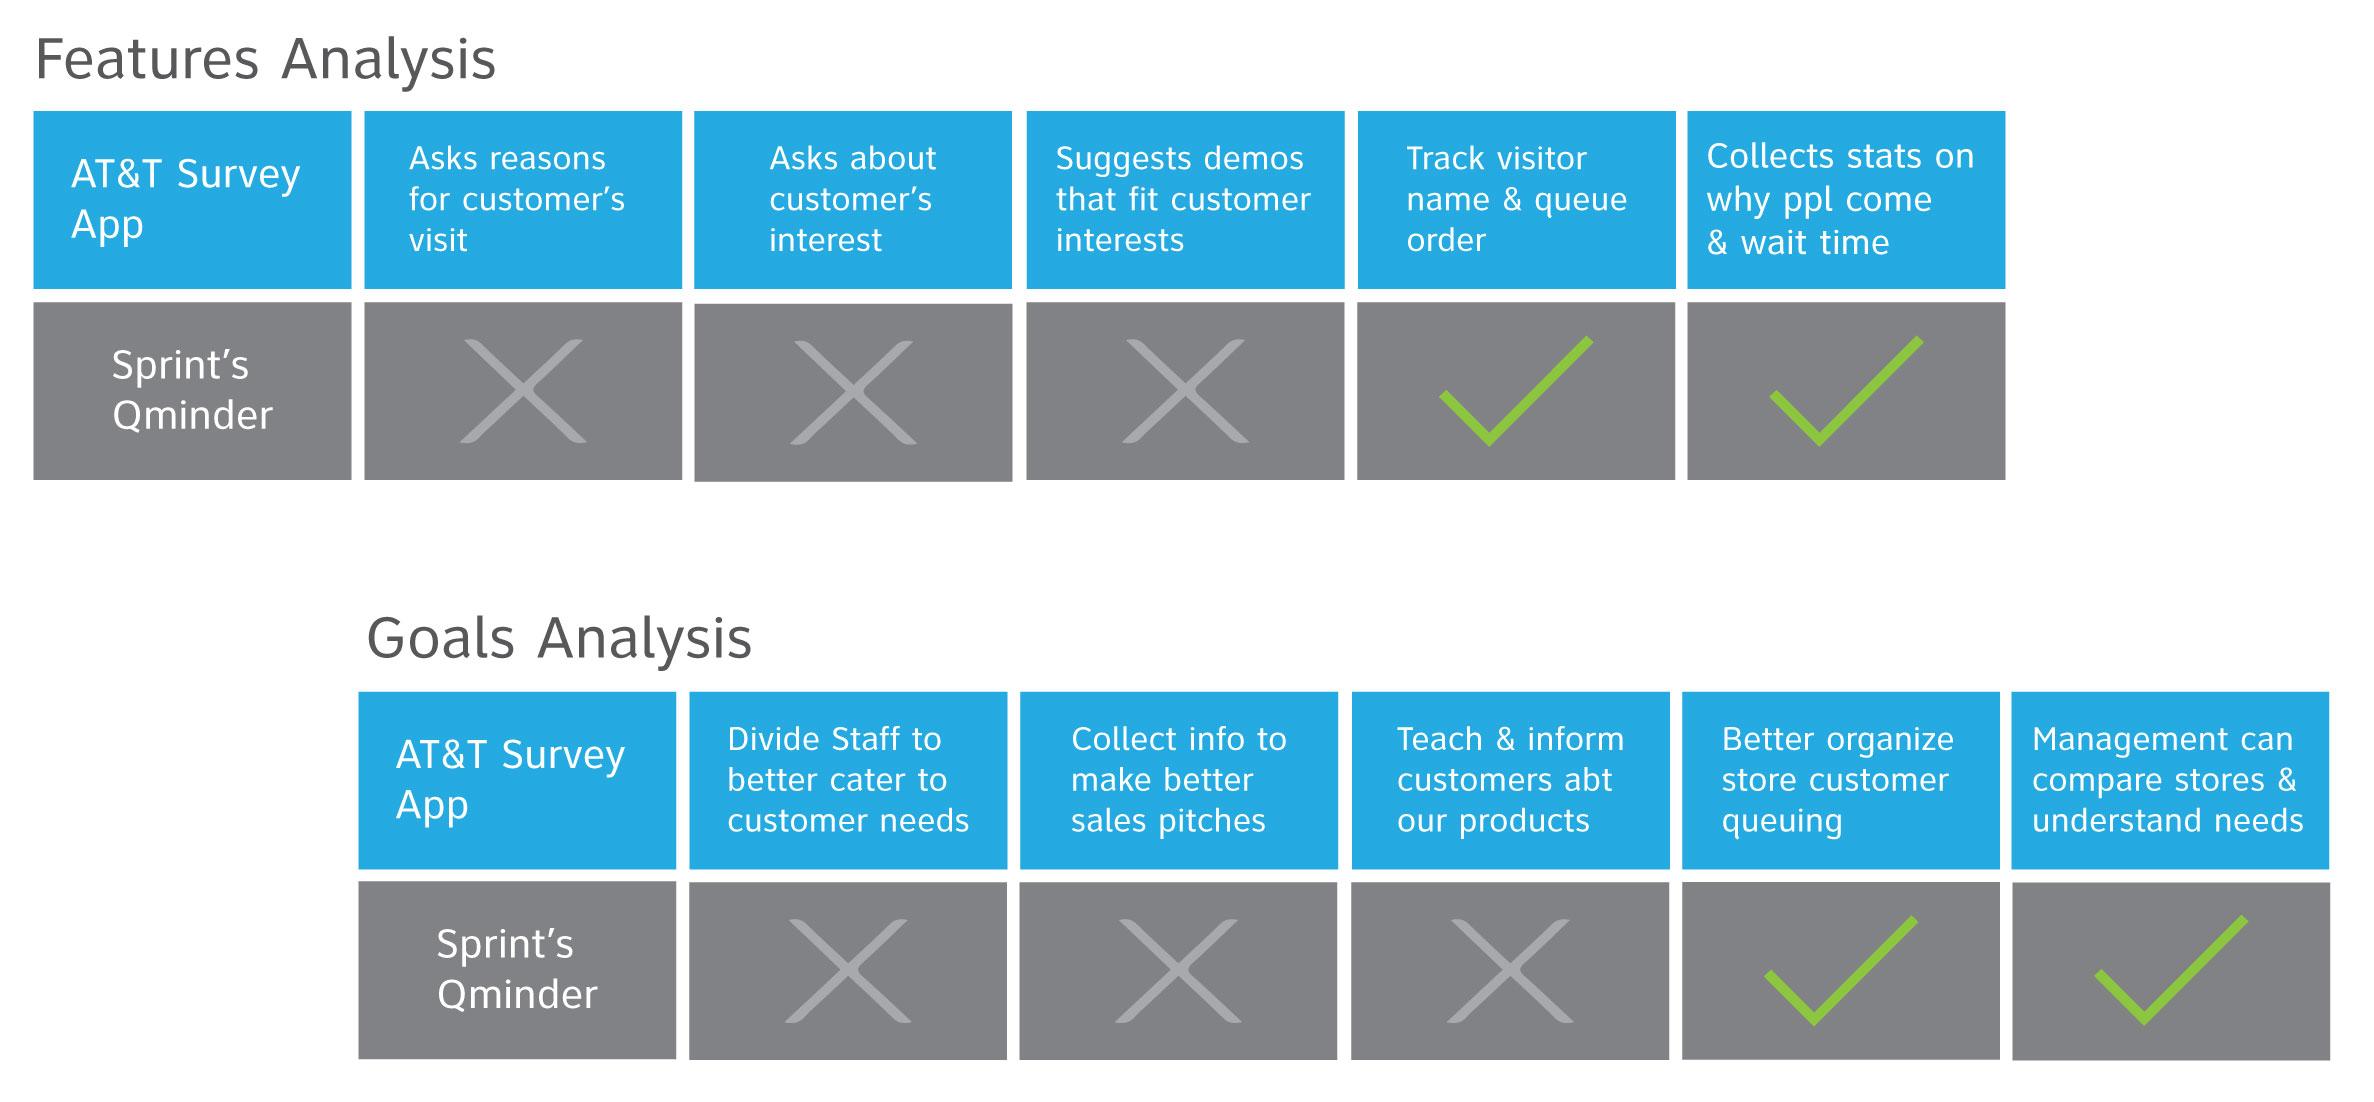 Survey-App-Competitive-Analysis.jpg